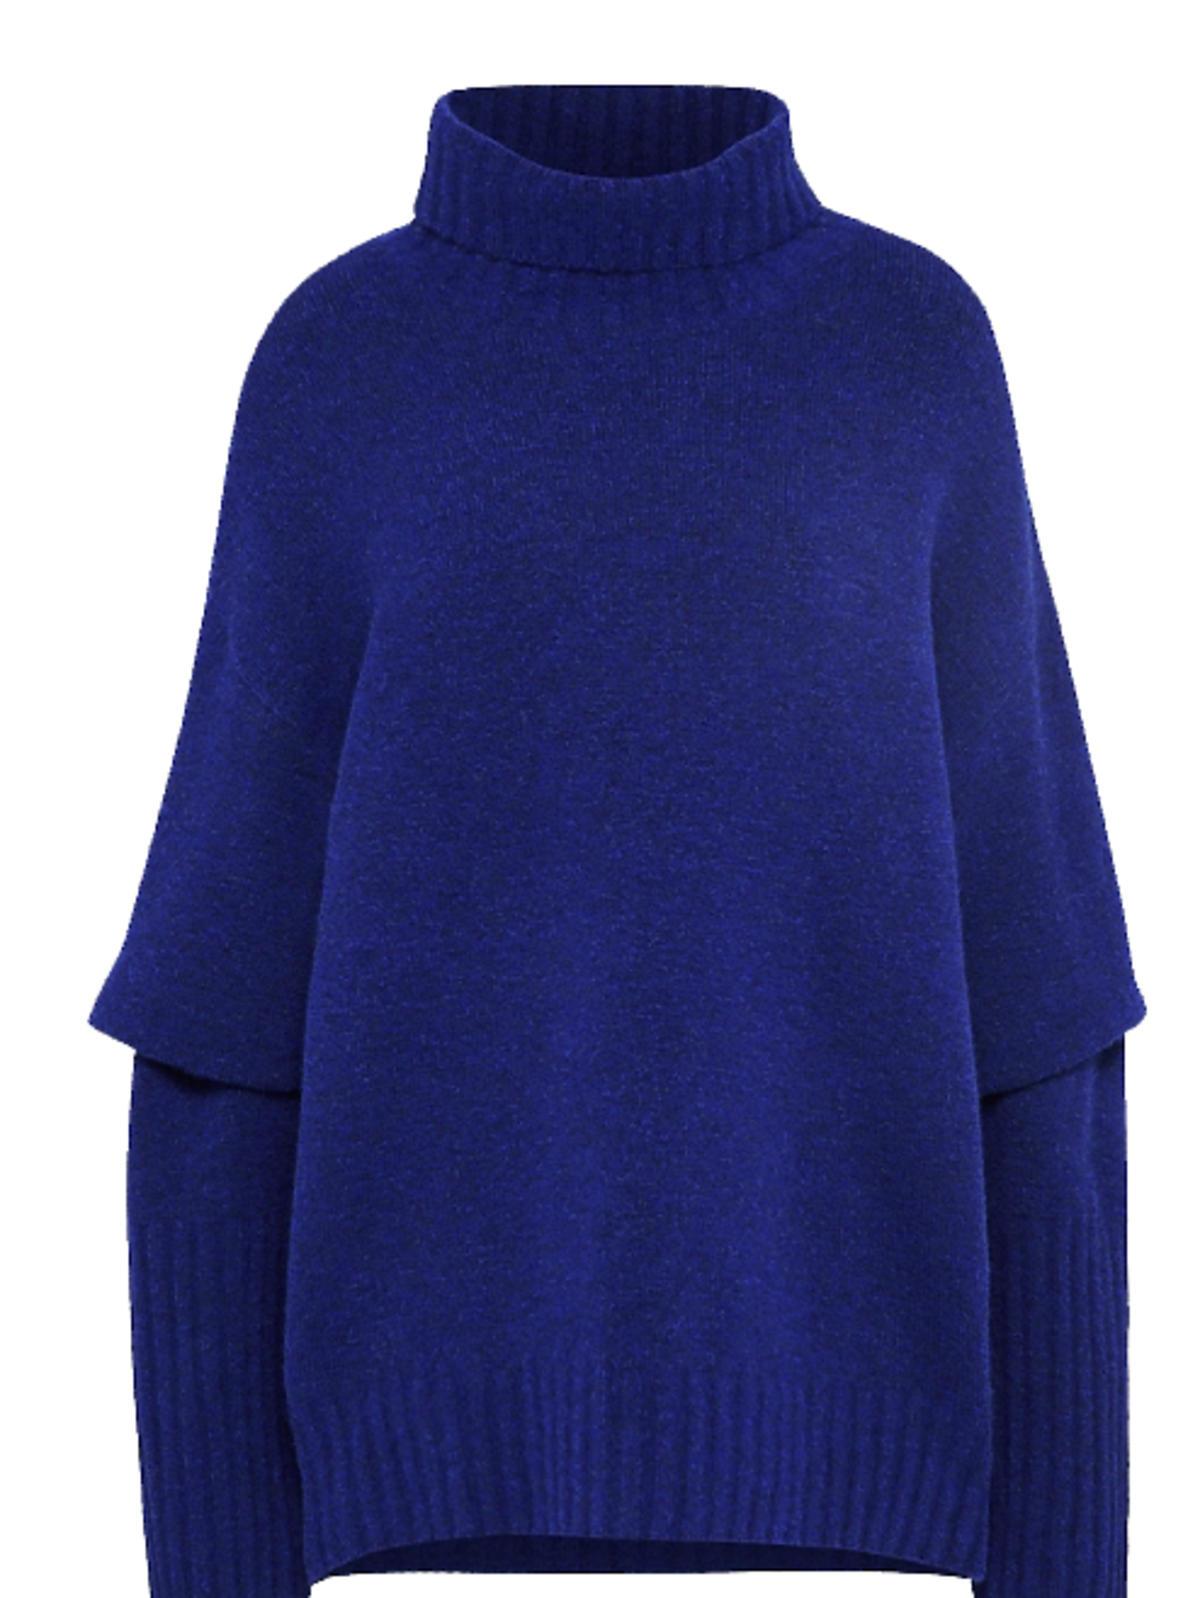 Sweter Edited 167,60 zł